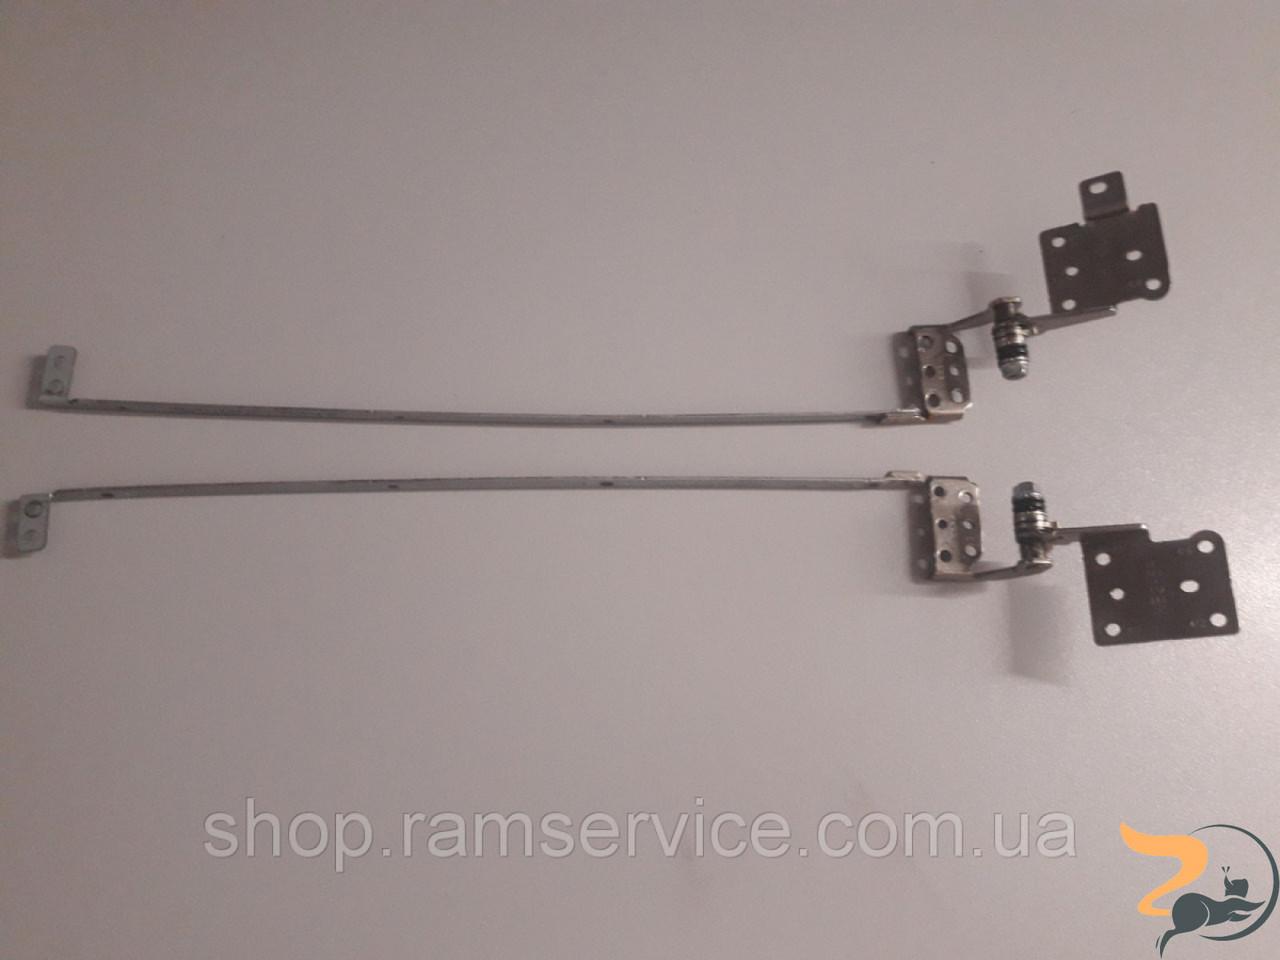 Петлі для ноутбука Asus A53E, 13GN3C10M040, 13GN3C10M030, б/в